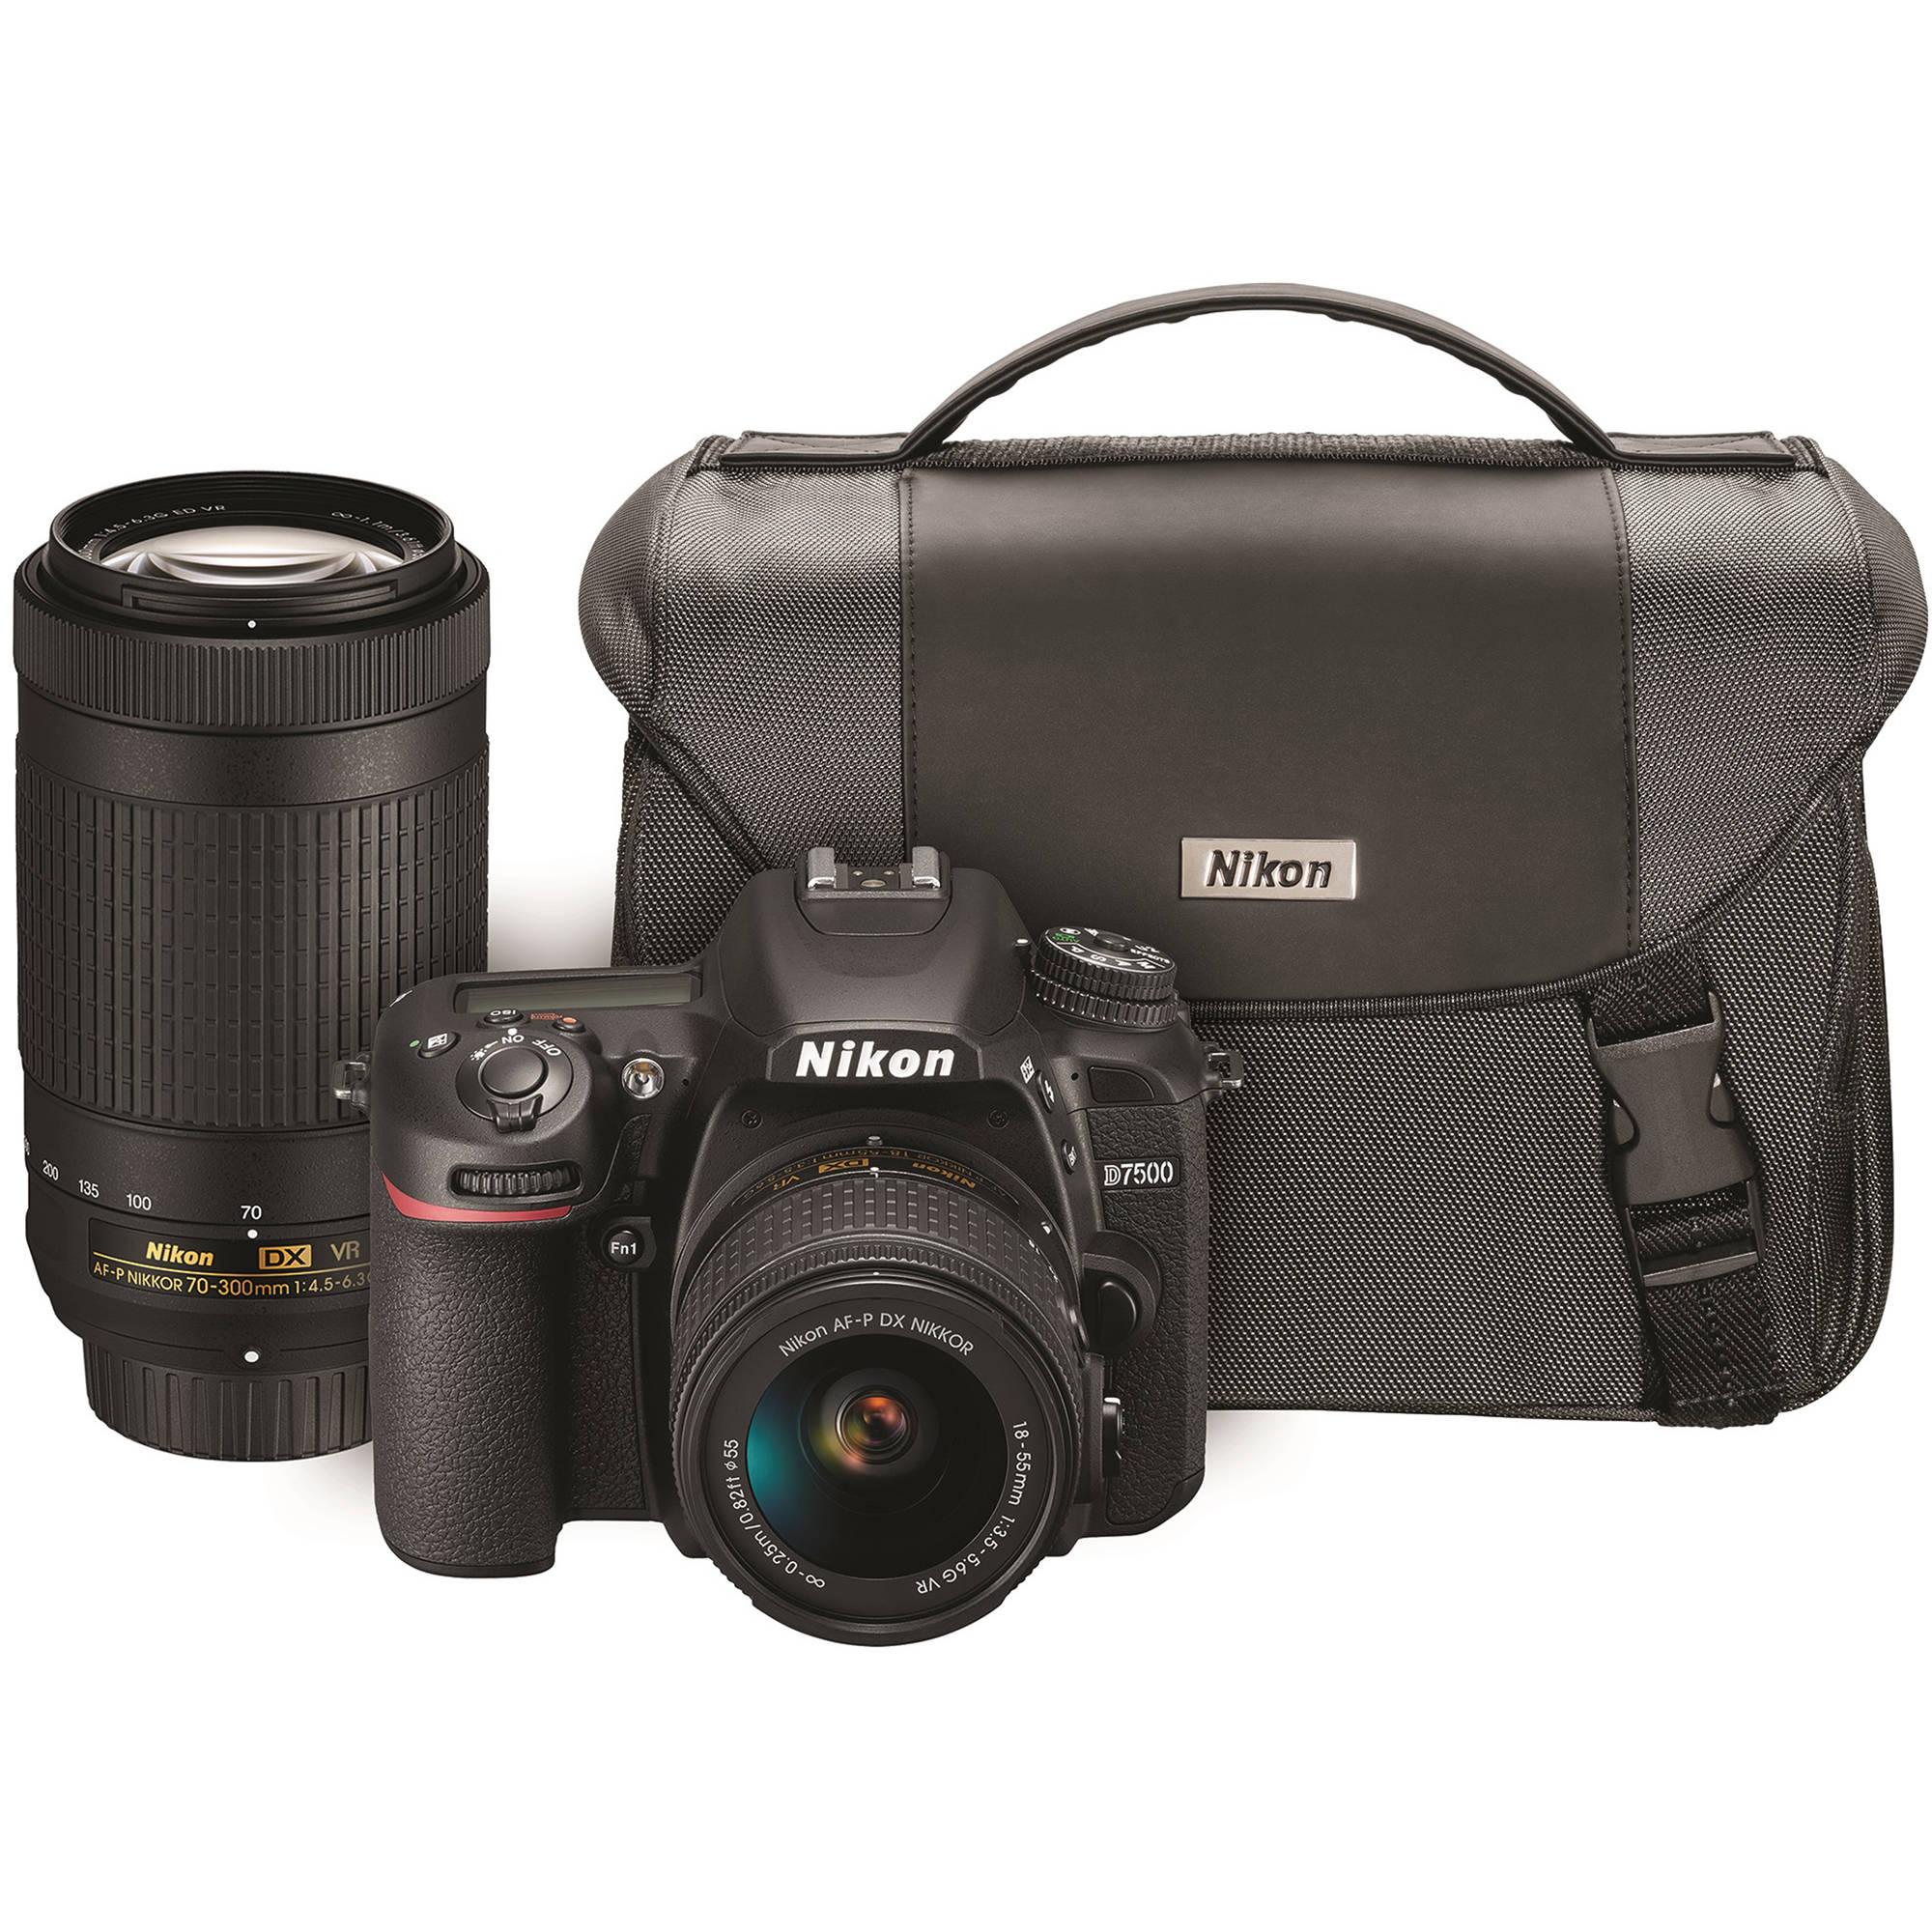 Nikon D7500 DSLR Camera with 18-55mm and 70-300mm VR Lenses Kit